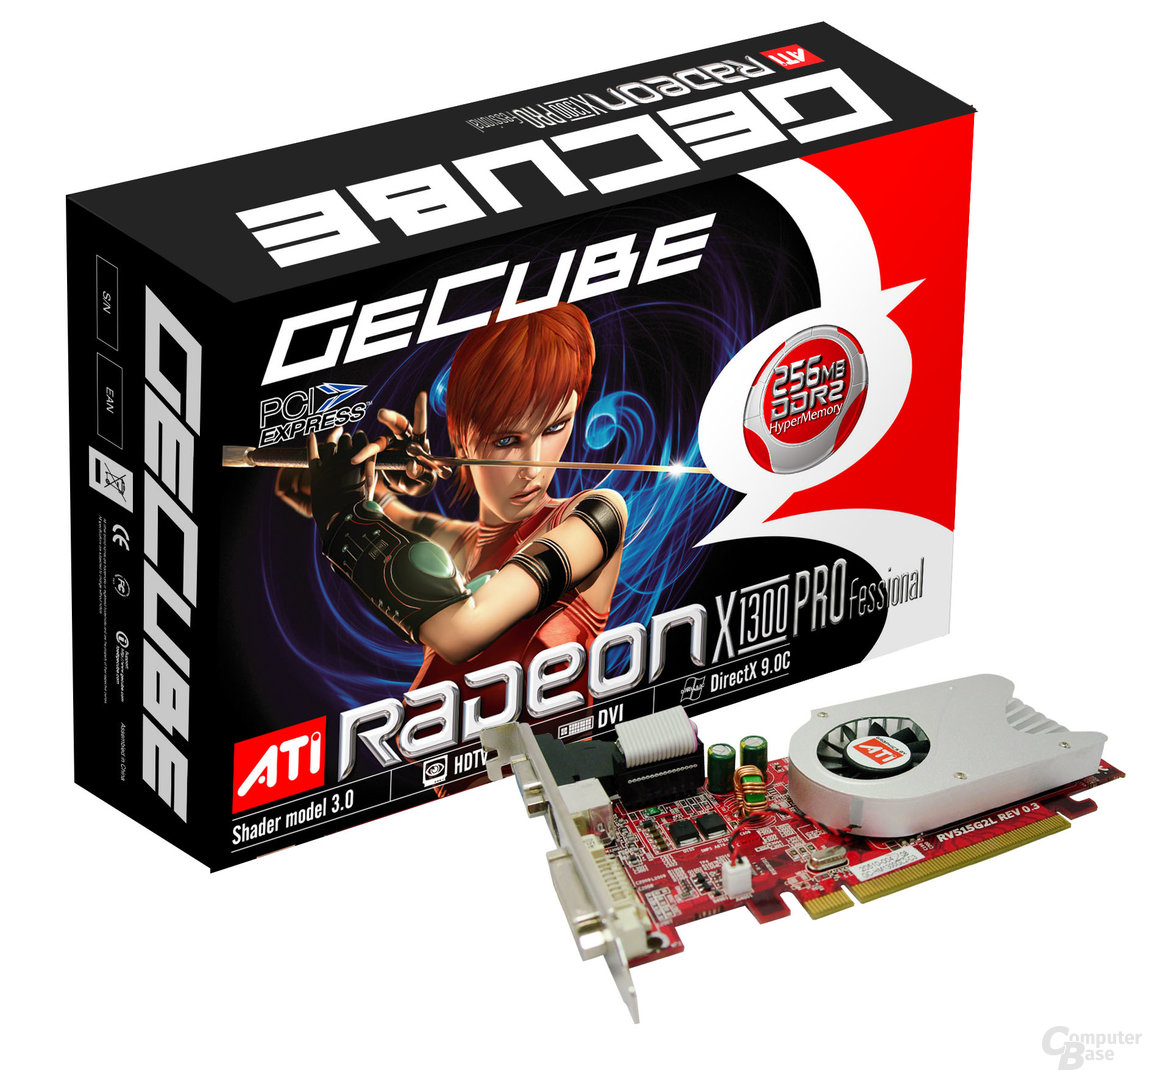 Gecube Radeon X1300 (GC-RX1300GA2-D3)